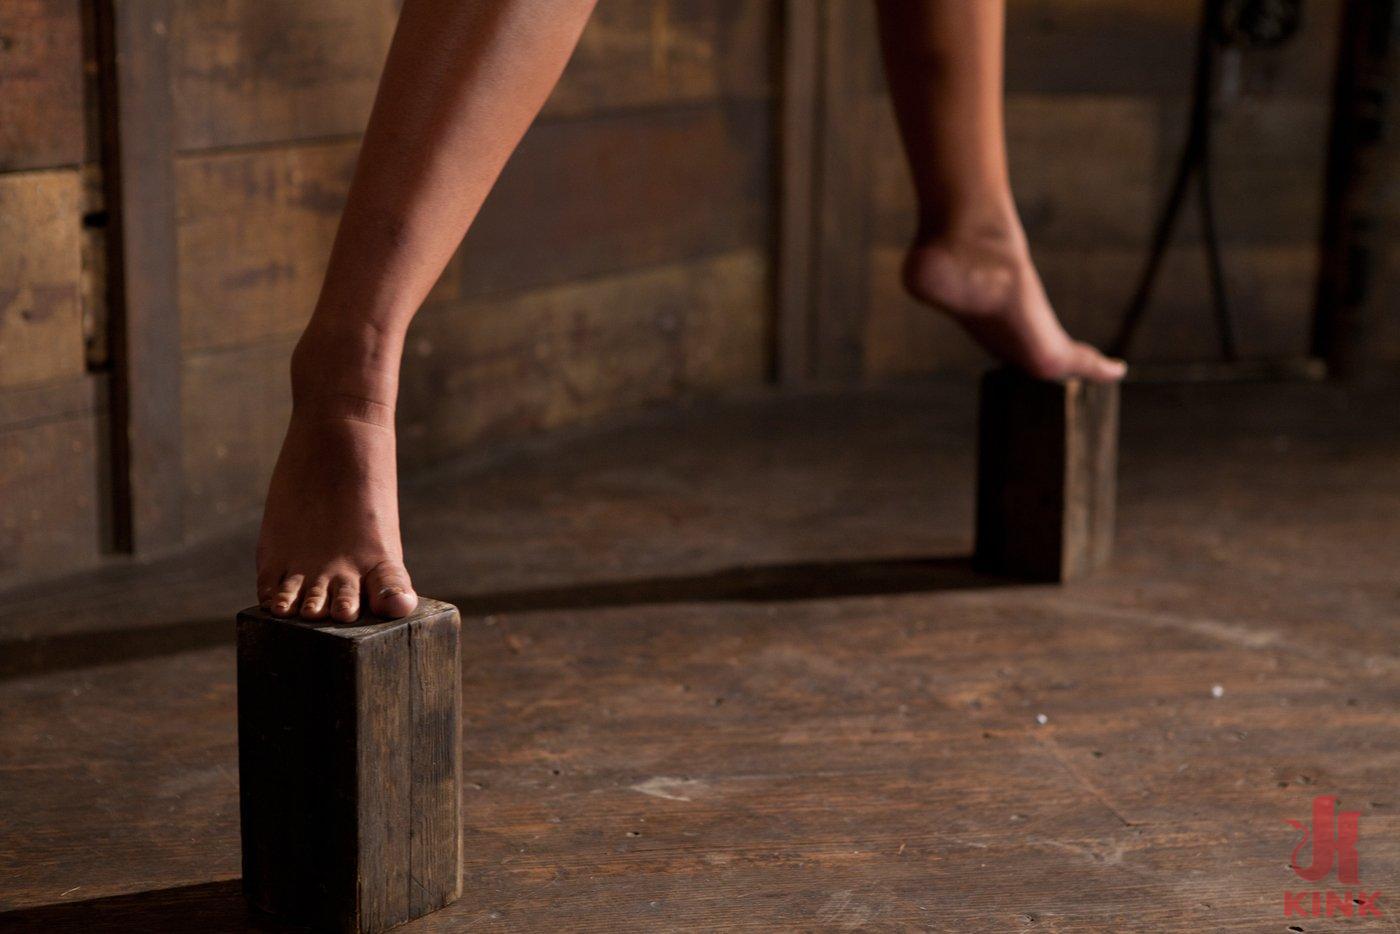 Torture sex hard crotch bdsm rope